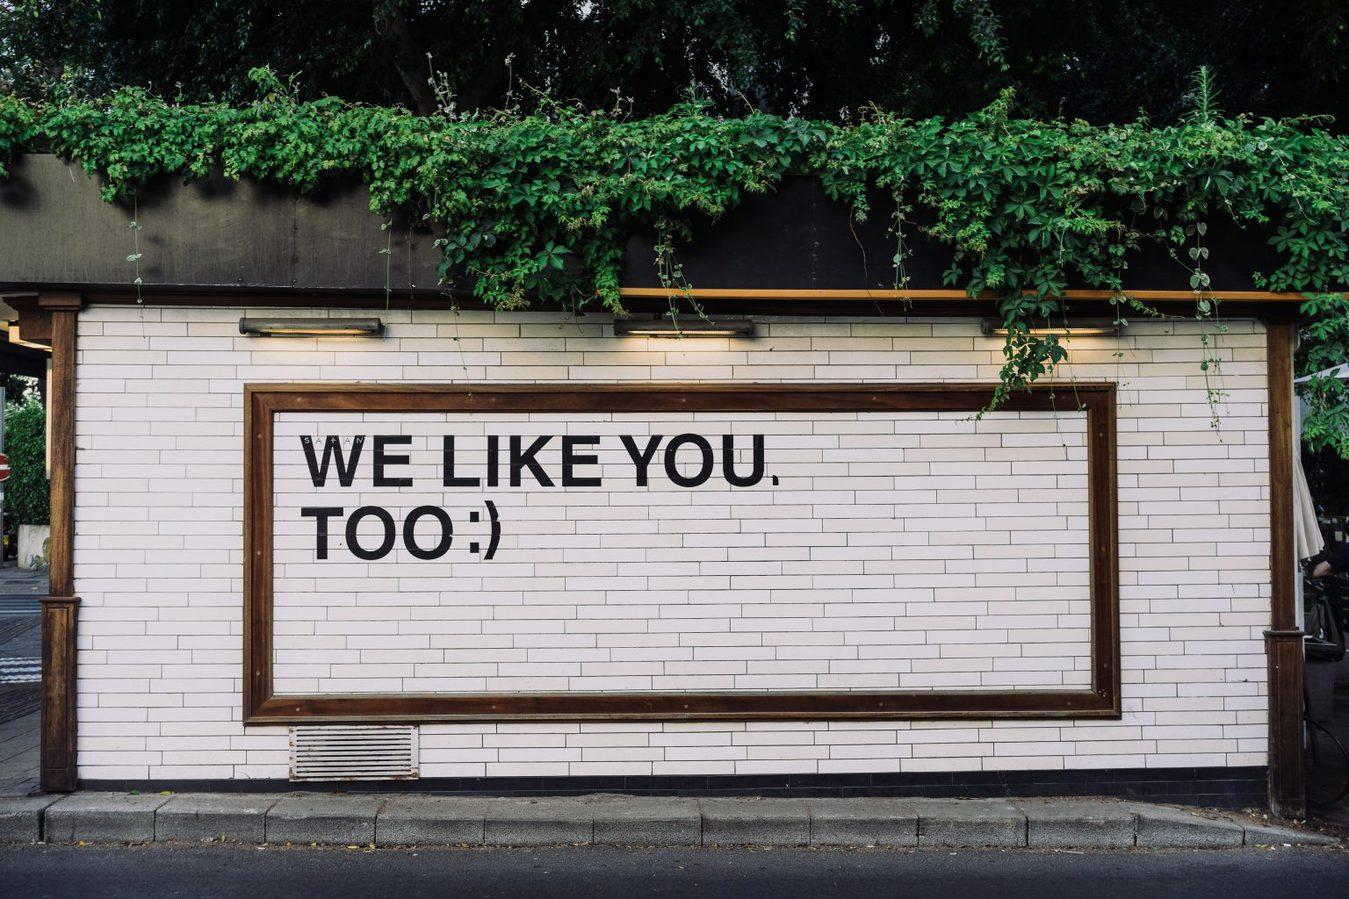 billboard on wall saying 'we like you, too'